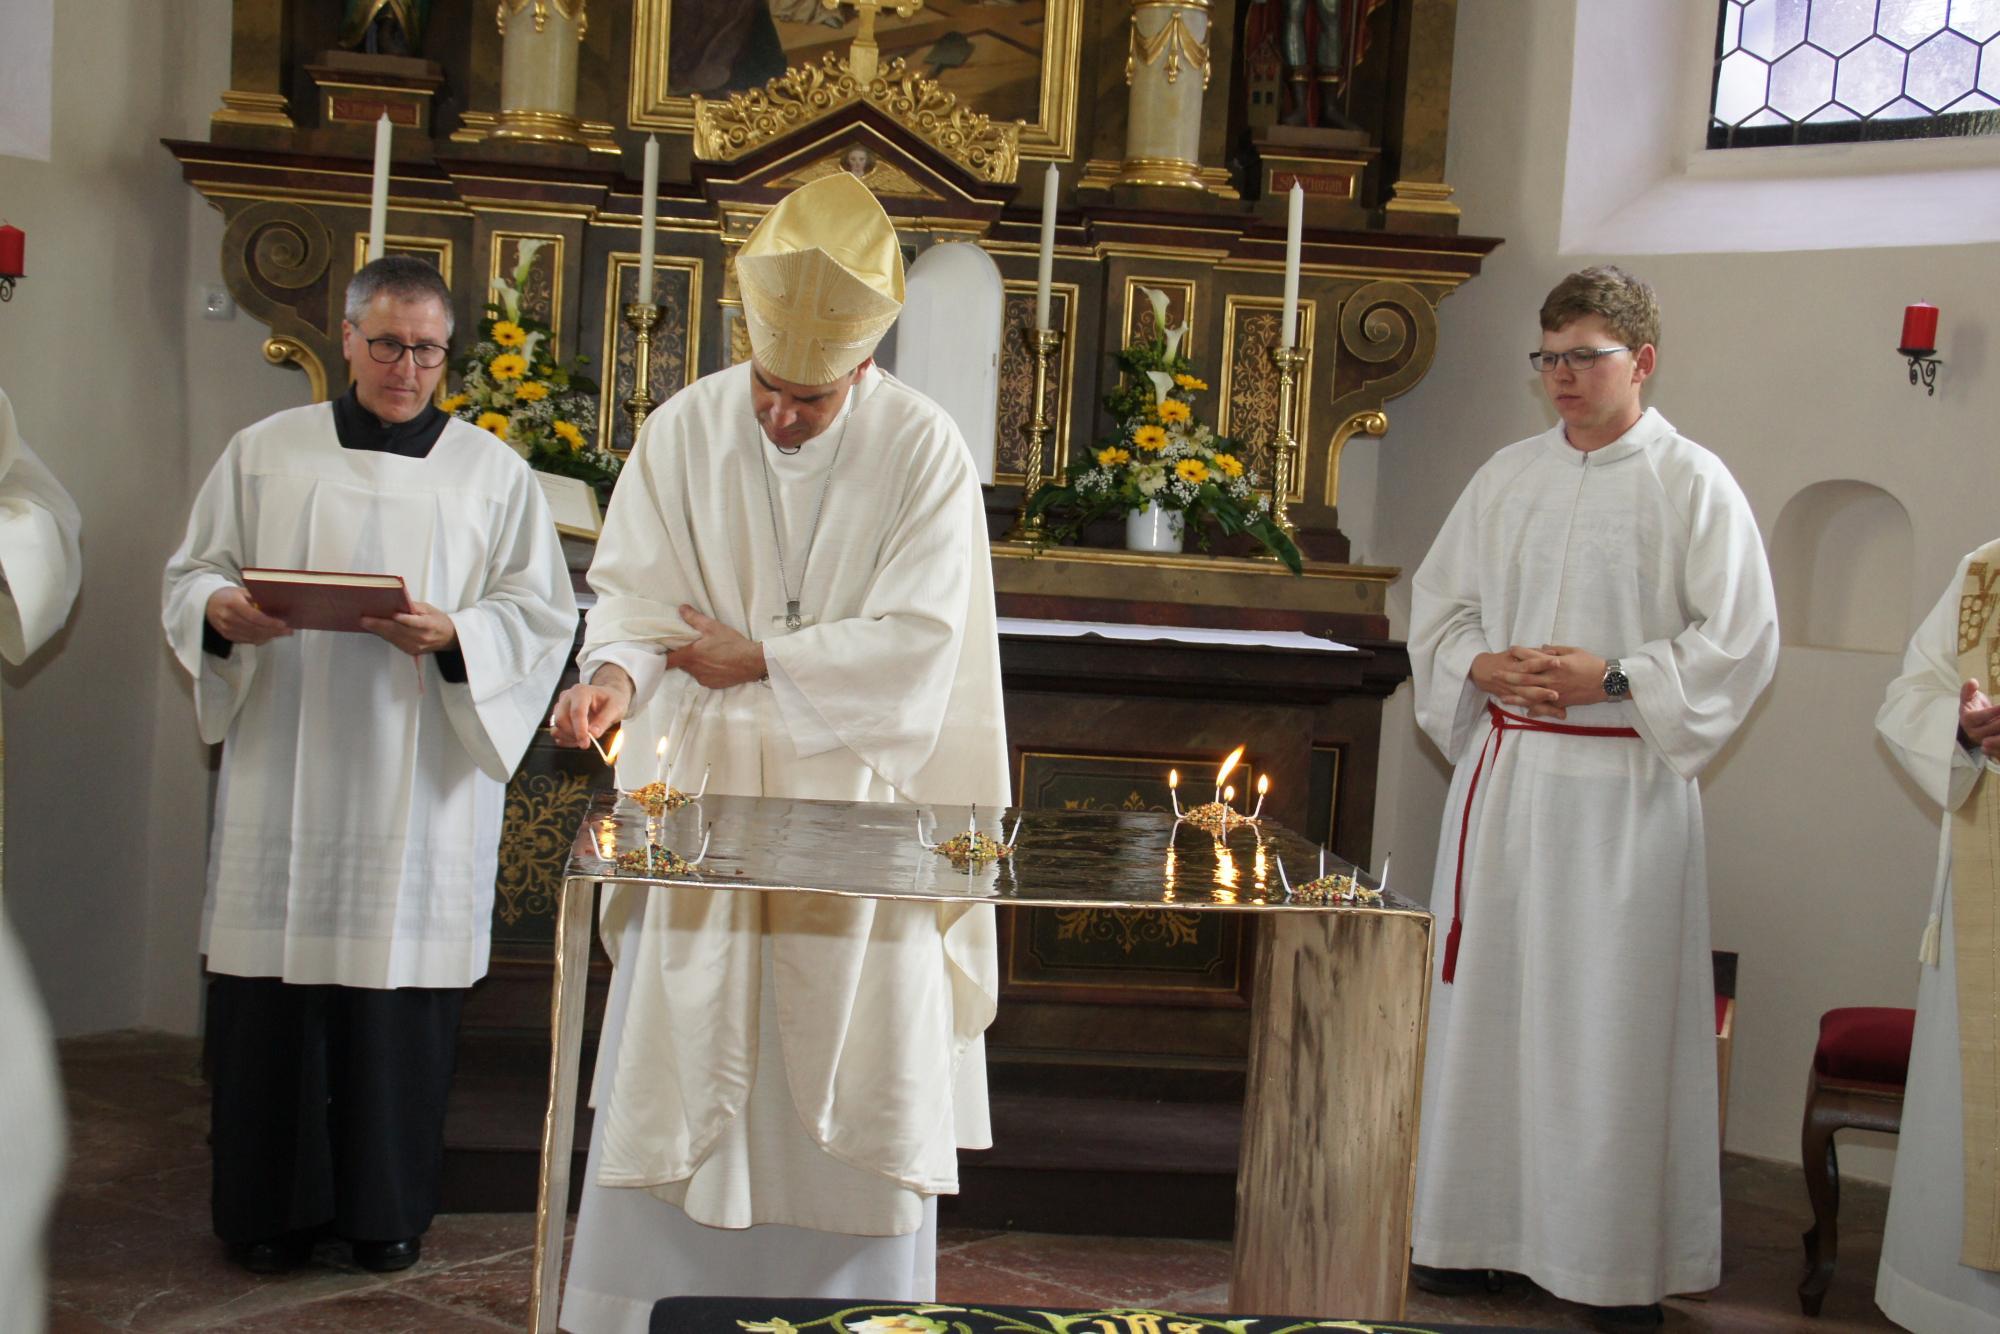 Altarweihe-Lengsham-DSC06305